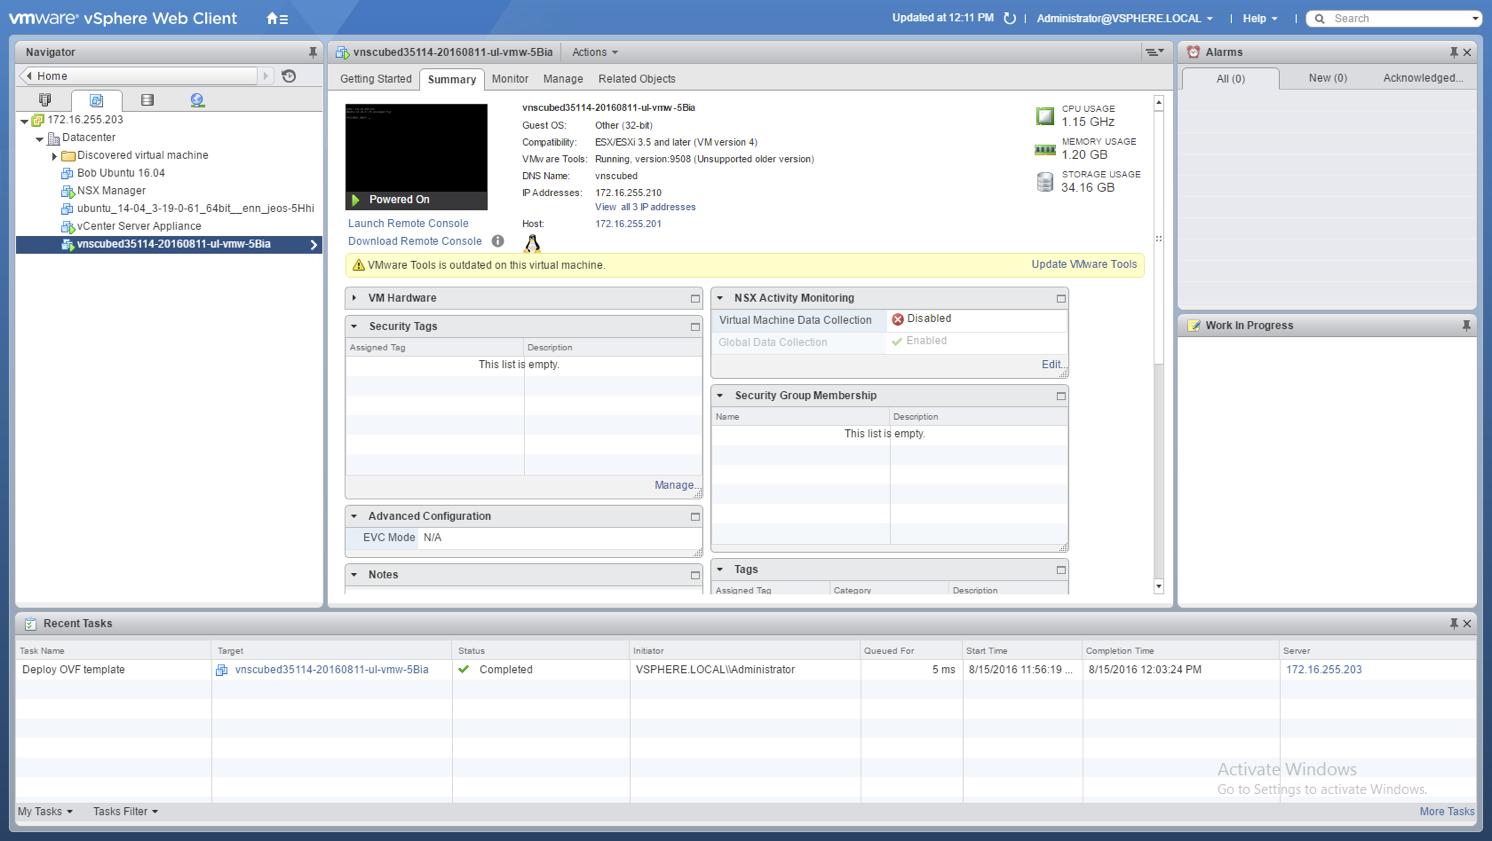 VNS3 Cloud Setup IaaS Vmware console